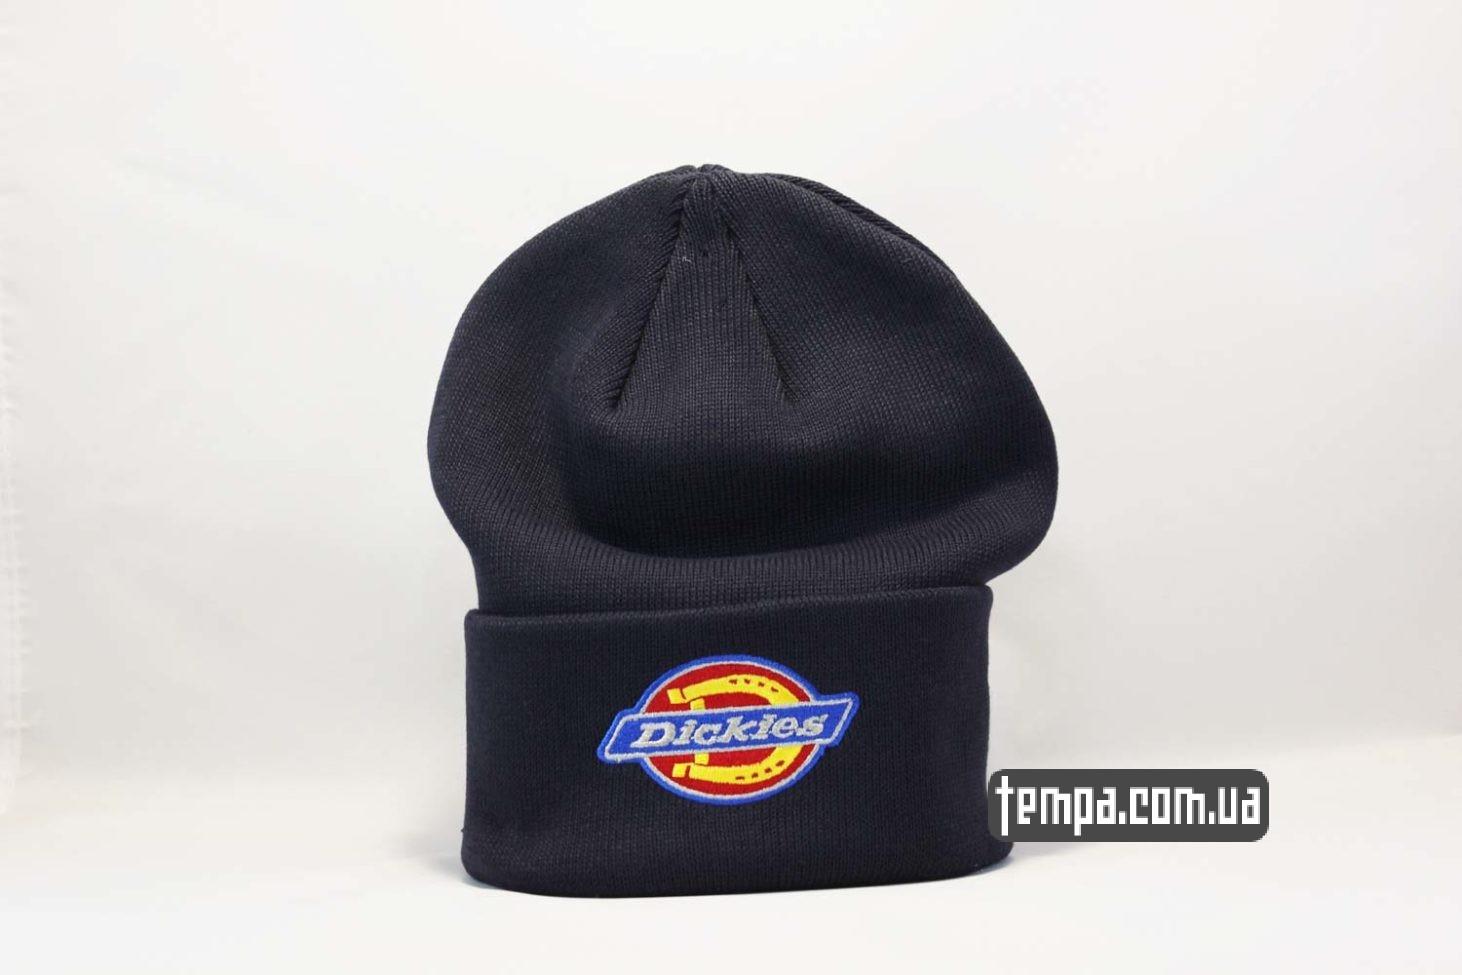 шапка beanie Dickies синяя купить Украина